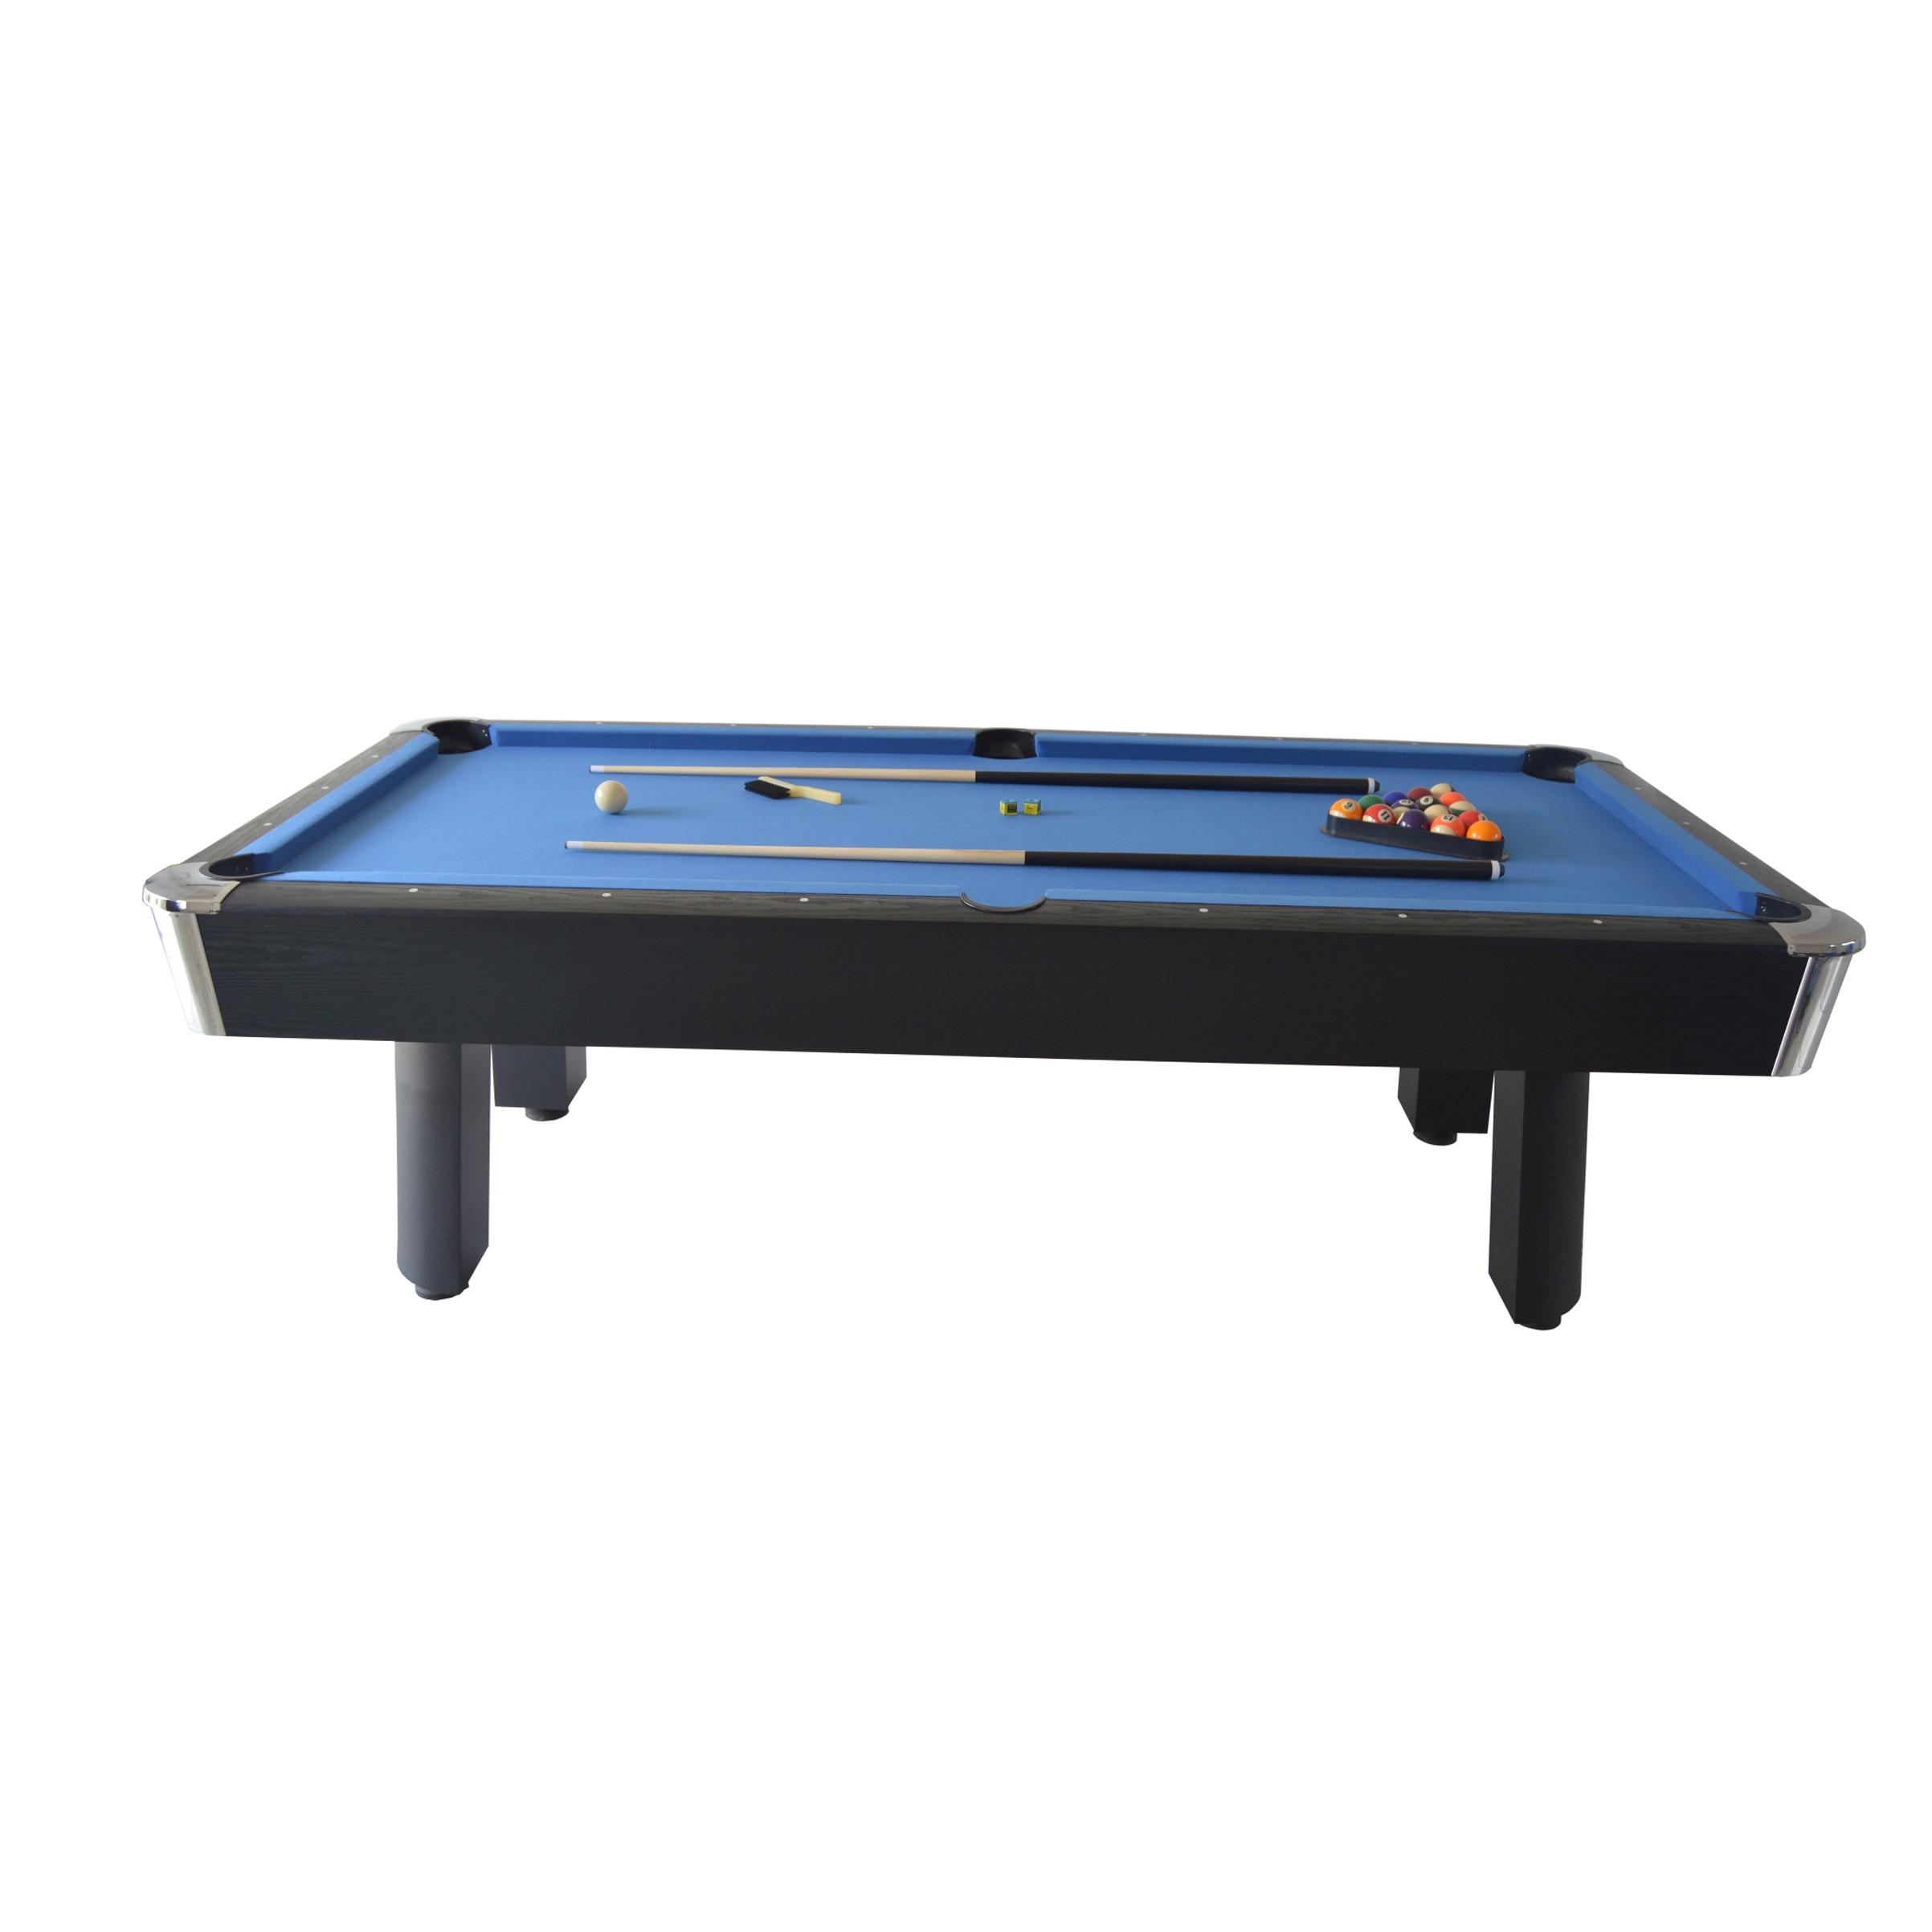 Sportcraft 8 FT Hawthorn Blue Billiard Table with Table Tennis Top